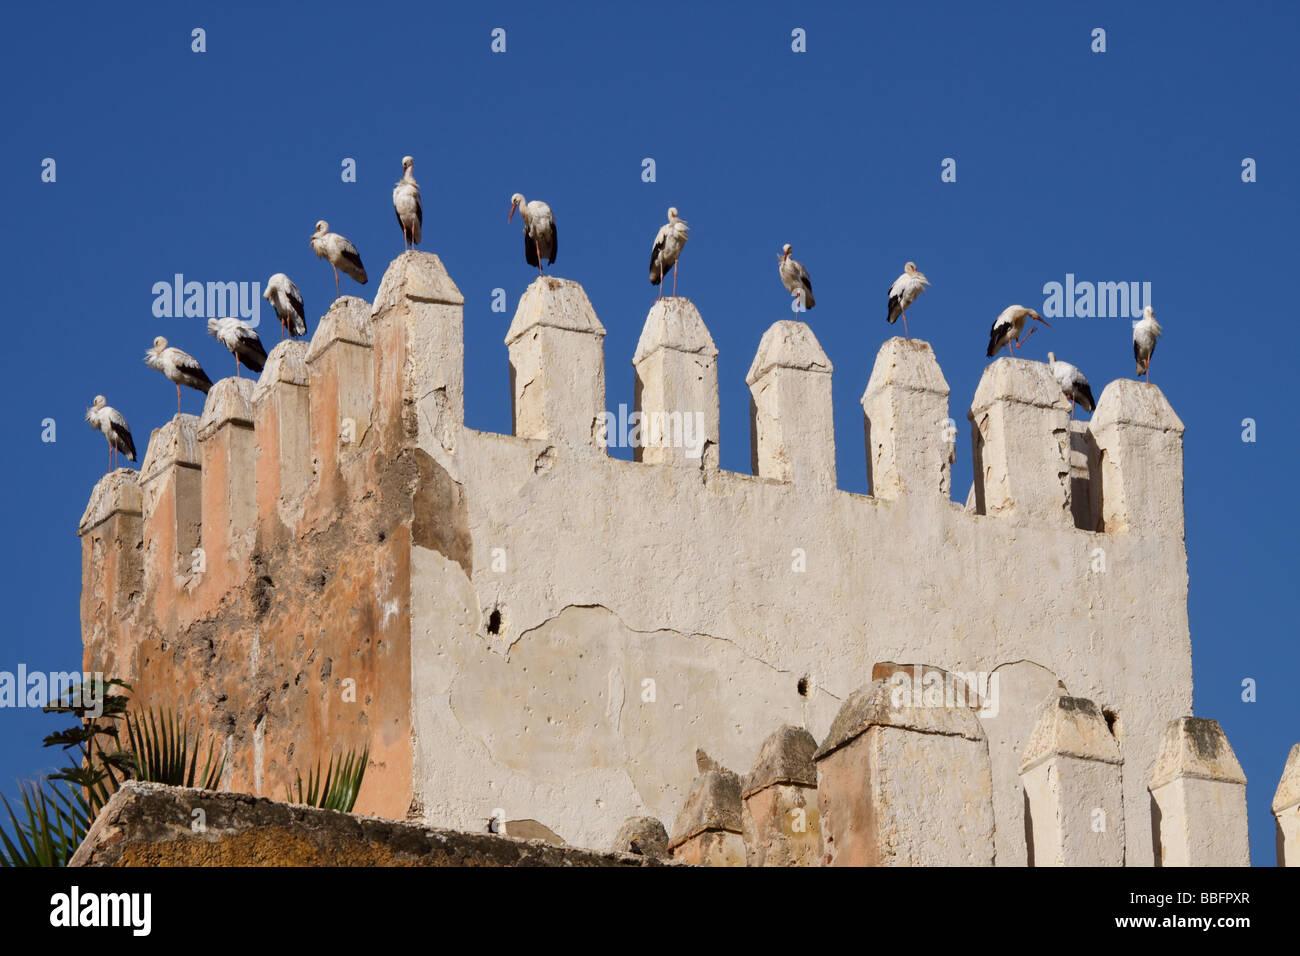 Afrika, Nordafrika, Marokko, Fes, Fès el-Jdid, Petit Mechouar, Bab Makina, Burg, Turm, thront Vögel Stockbild